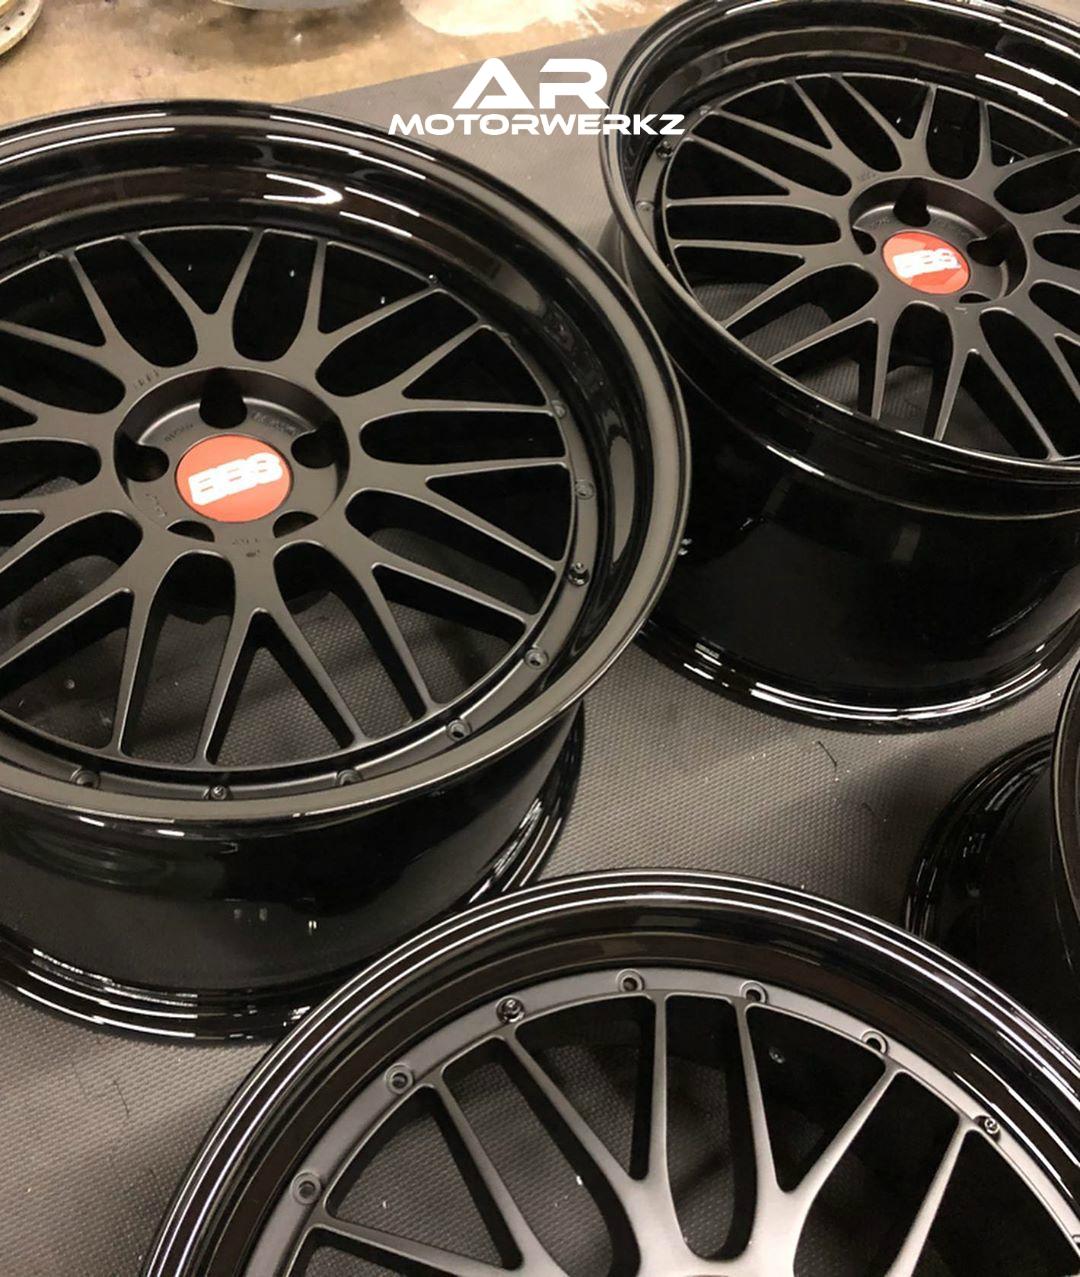 Bbs Lm Custom Satin Black Ar Motorwerkz